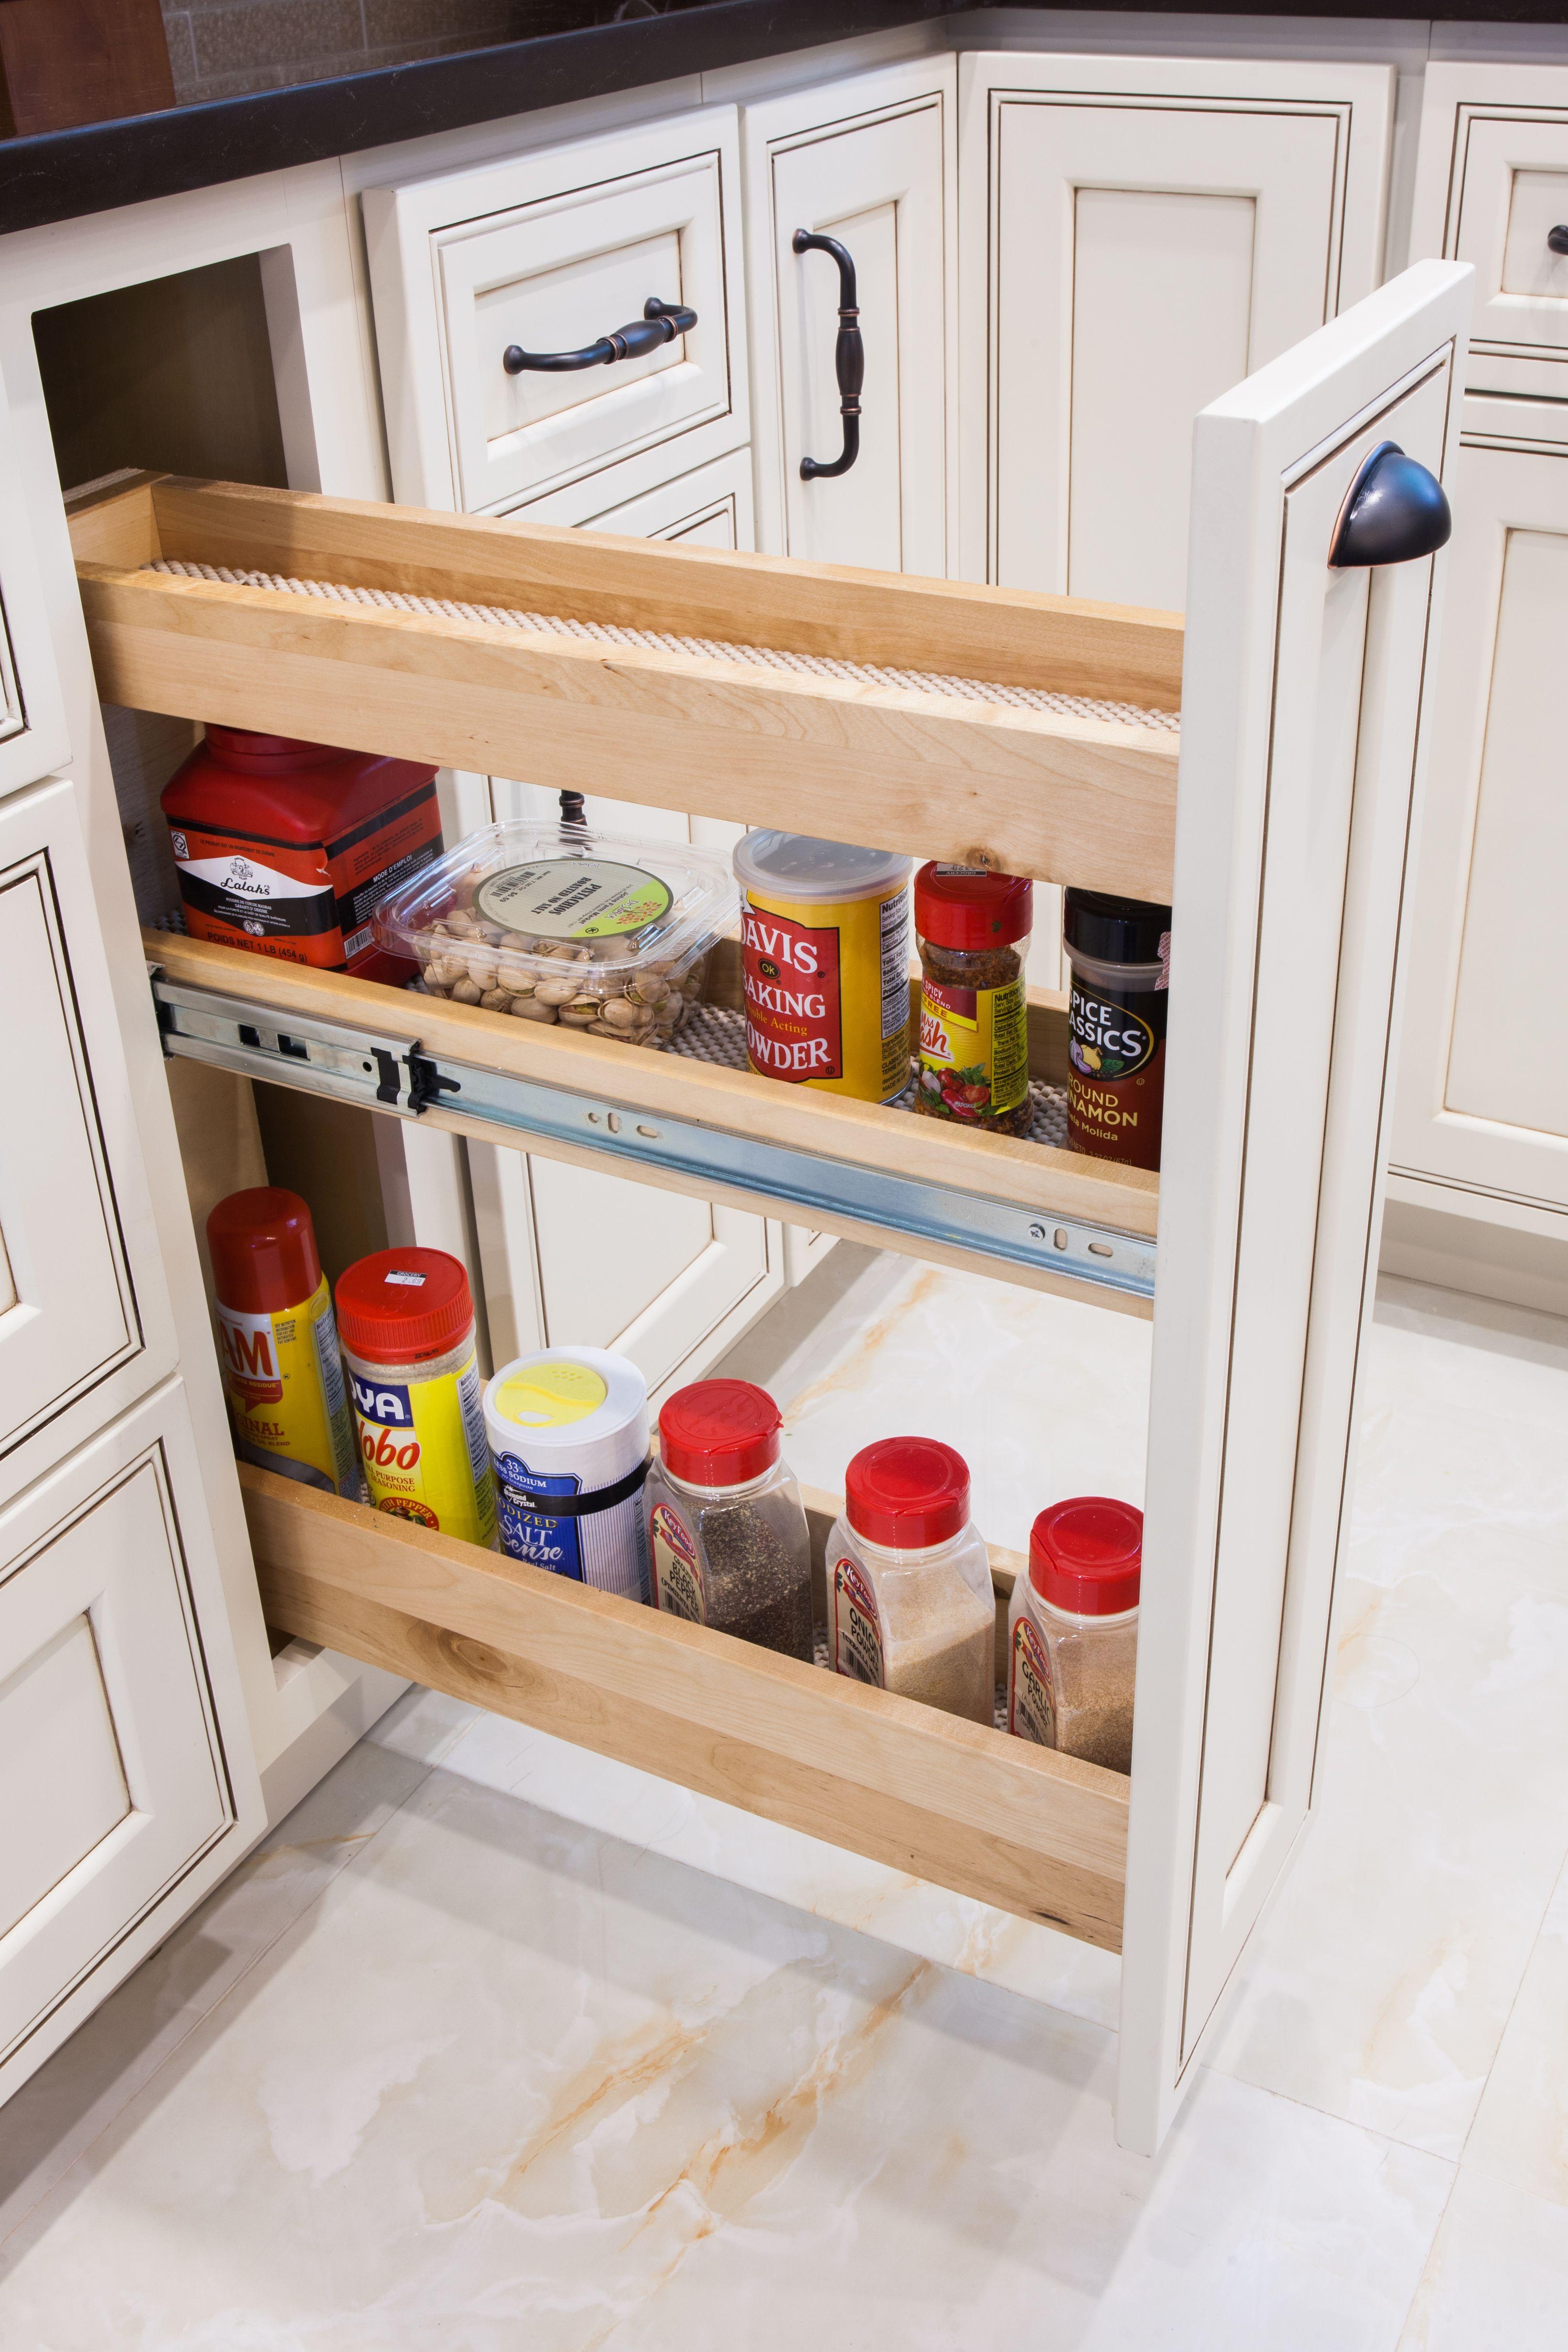 Home Cabinet Westbury H9 Style Kitchen Add On Spice Rack Kitchen Remodel Kitchen Bathroom Remodel Spice Rack